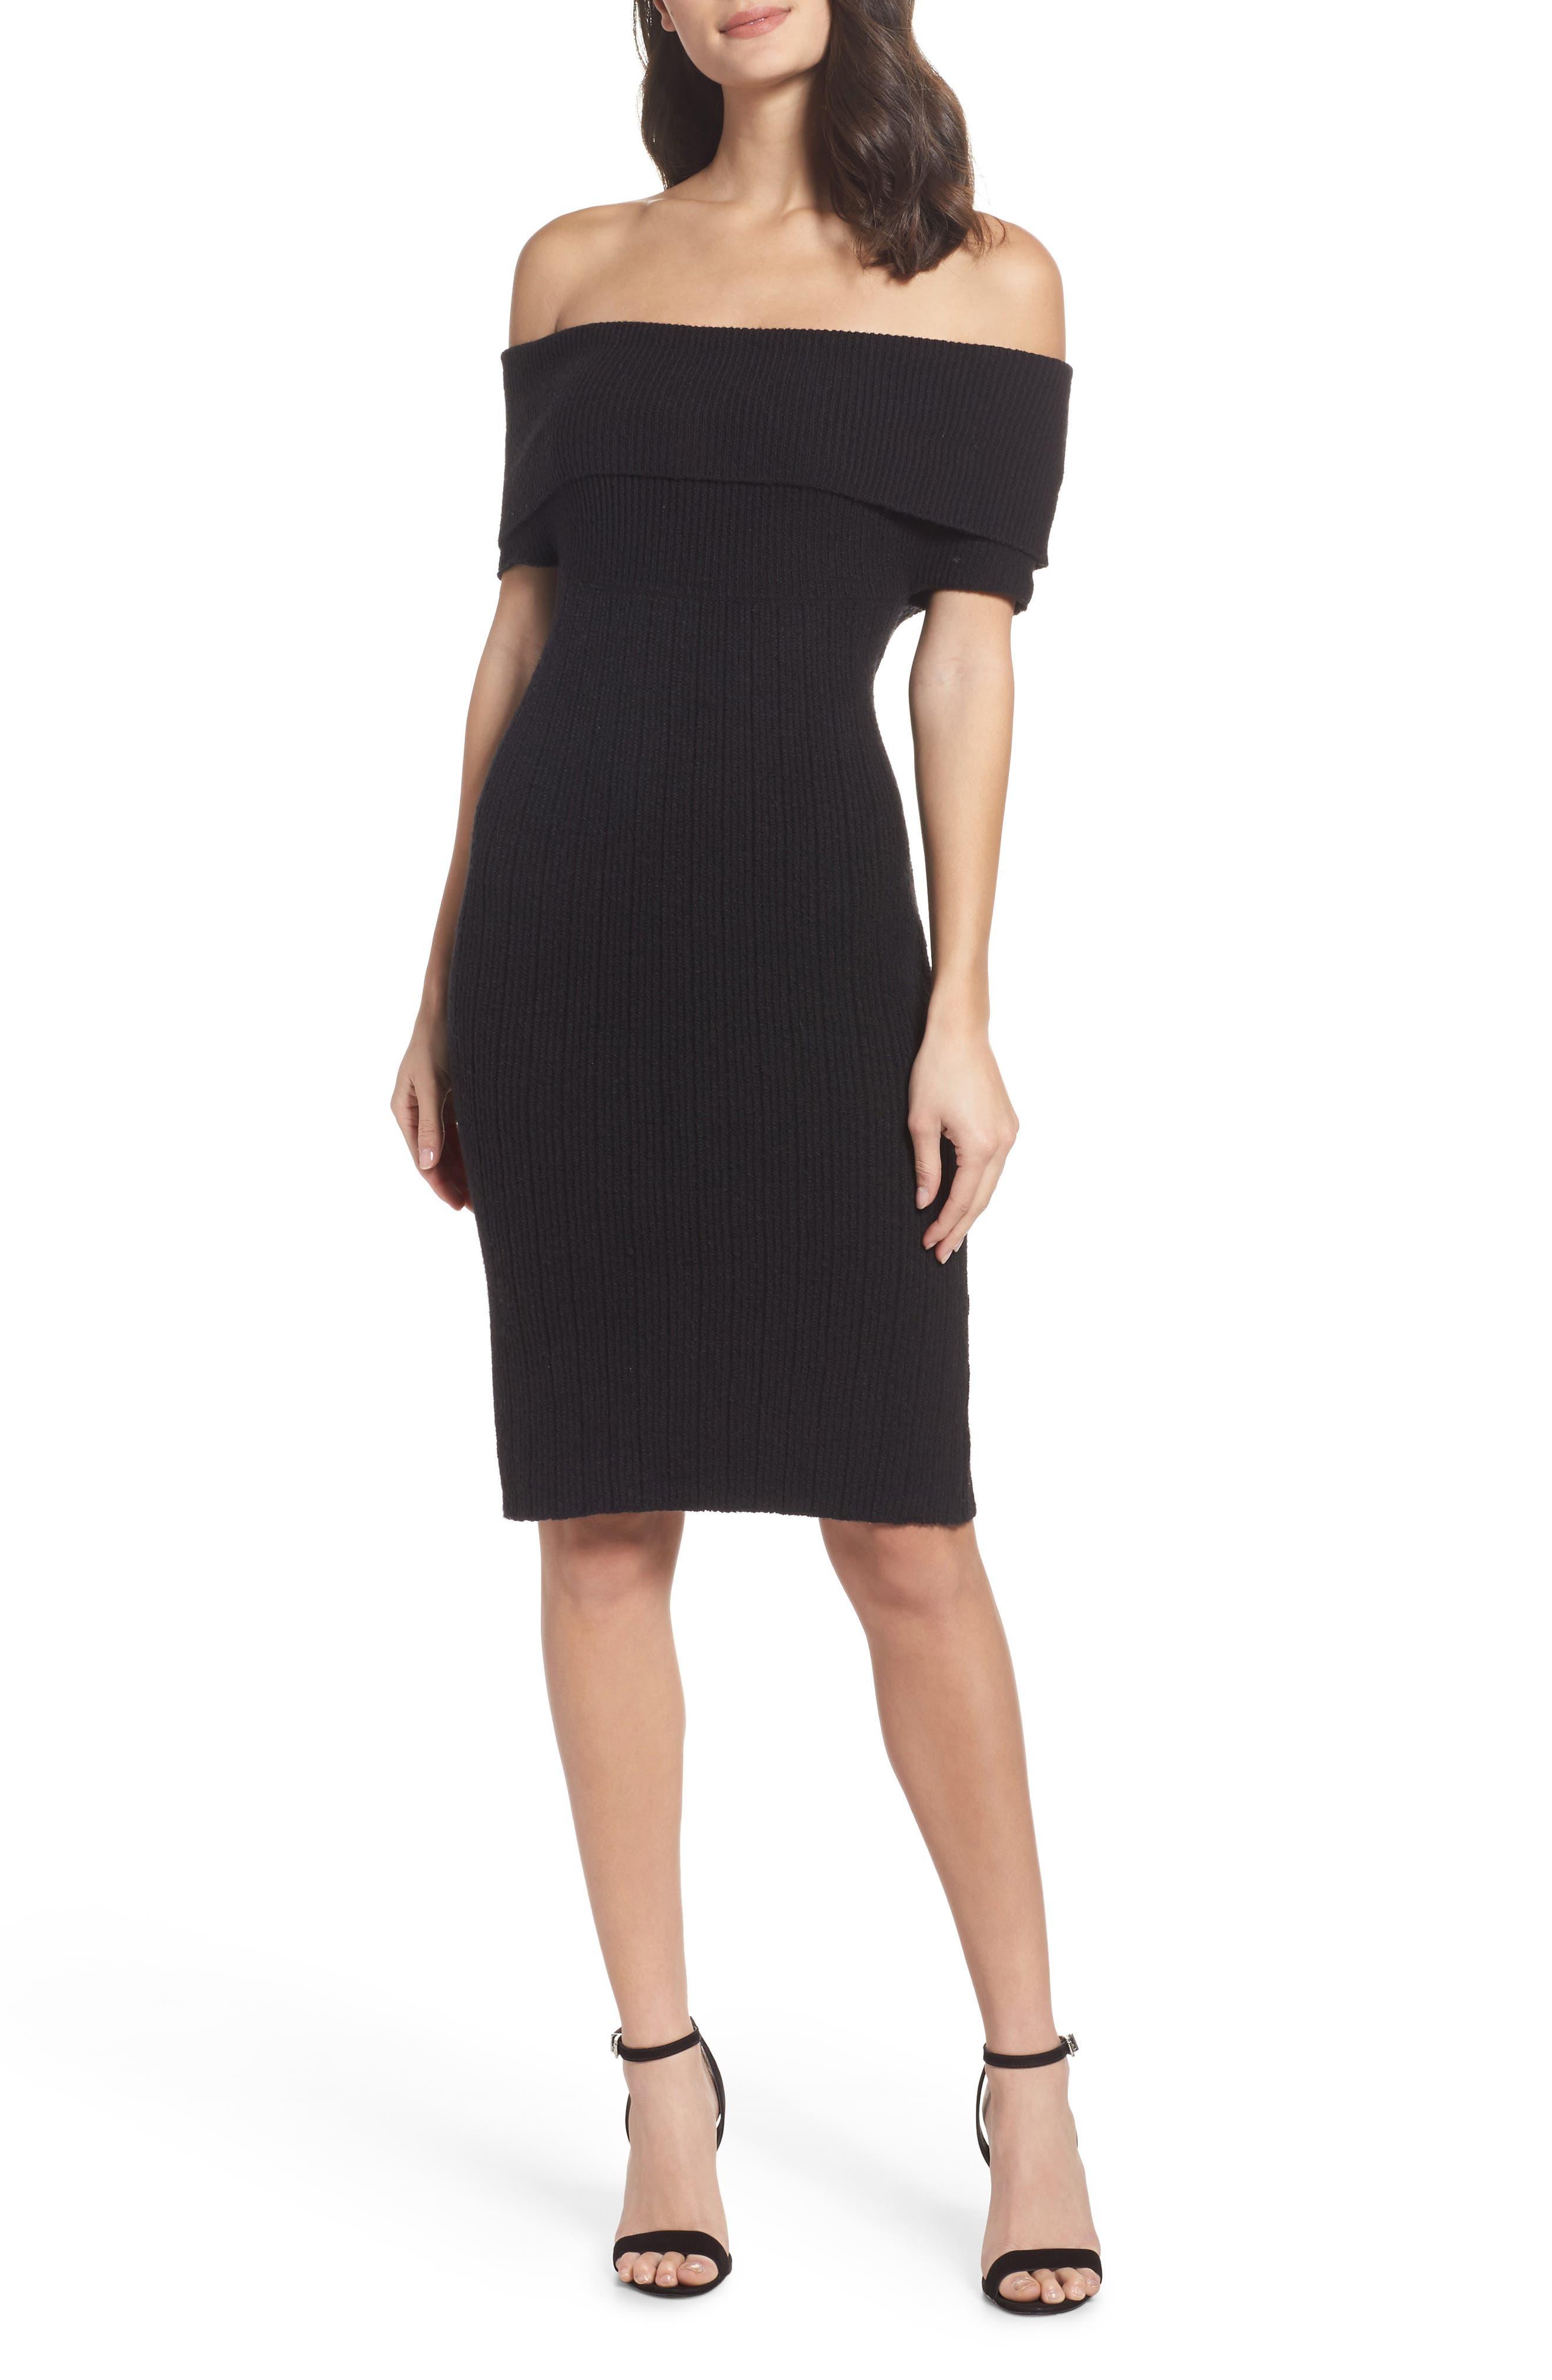 Alternate Image 1 Selected - BB Dakota Porter Off the Shoulder Sheath Dress